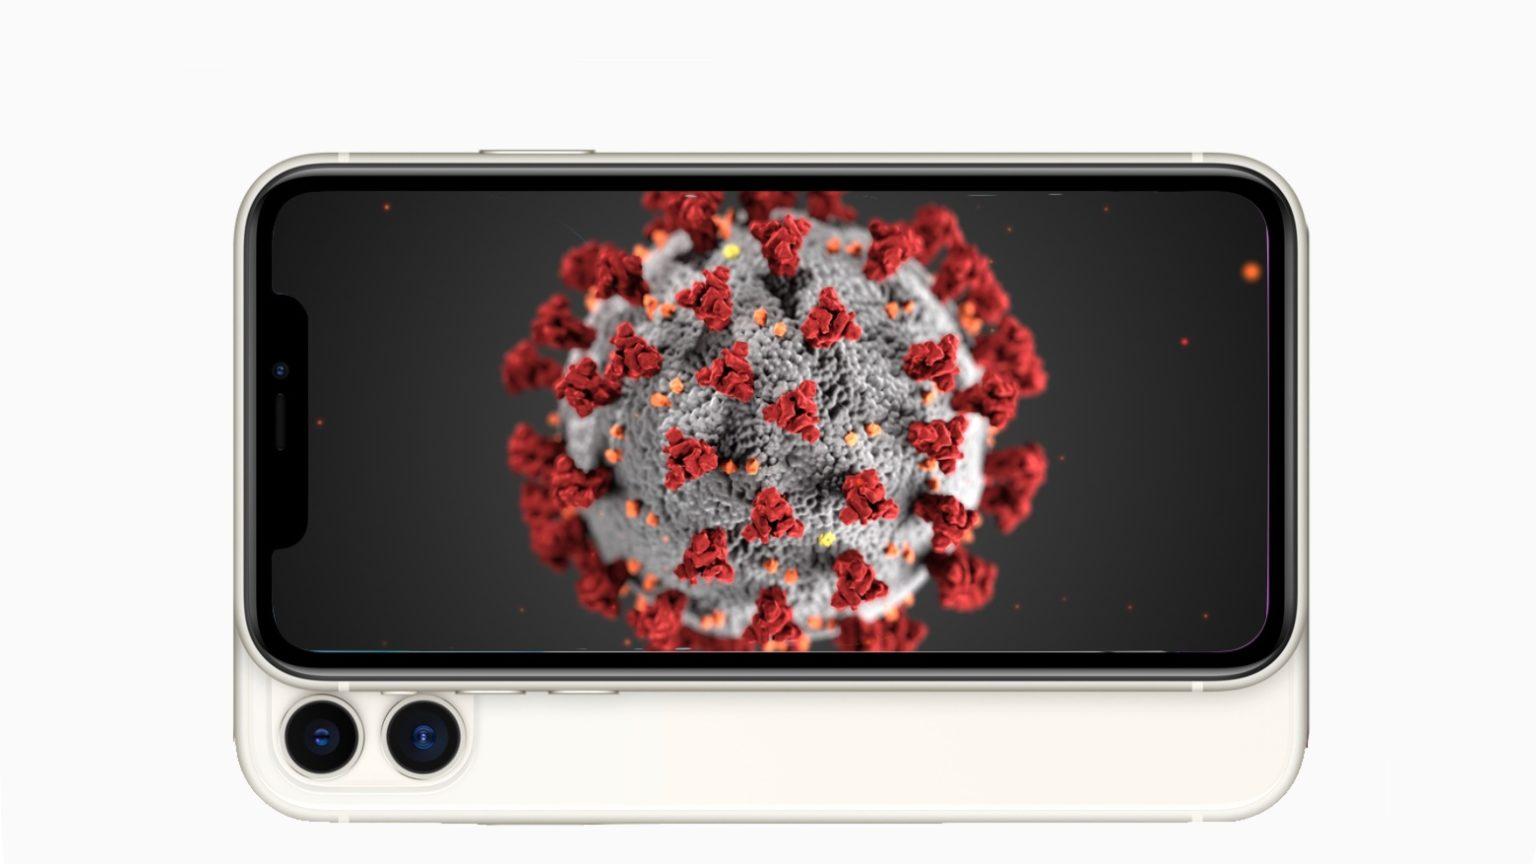 iPhone showing coronavirus that causes COVID-19